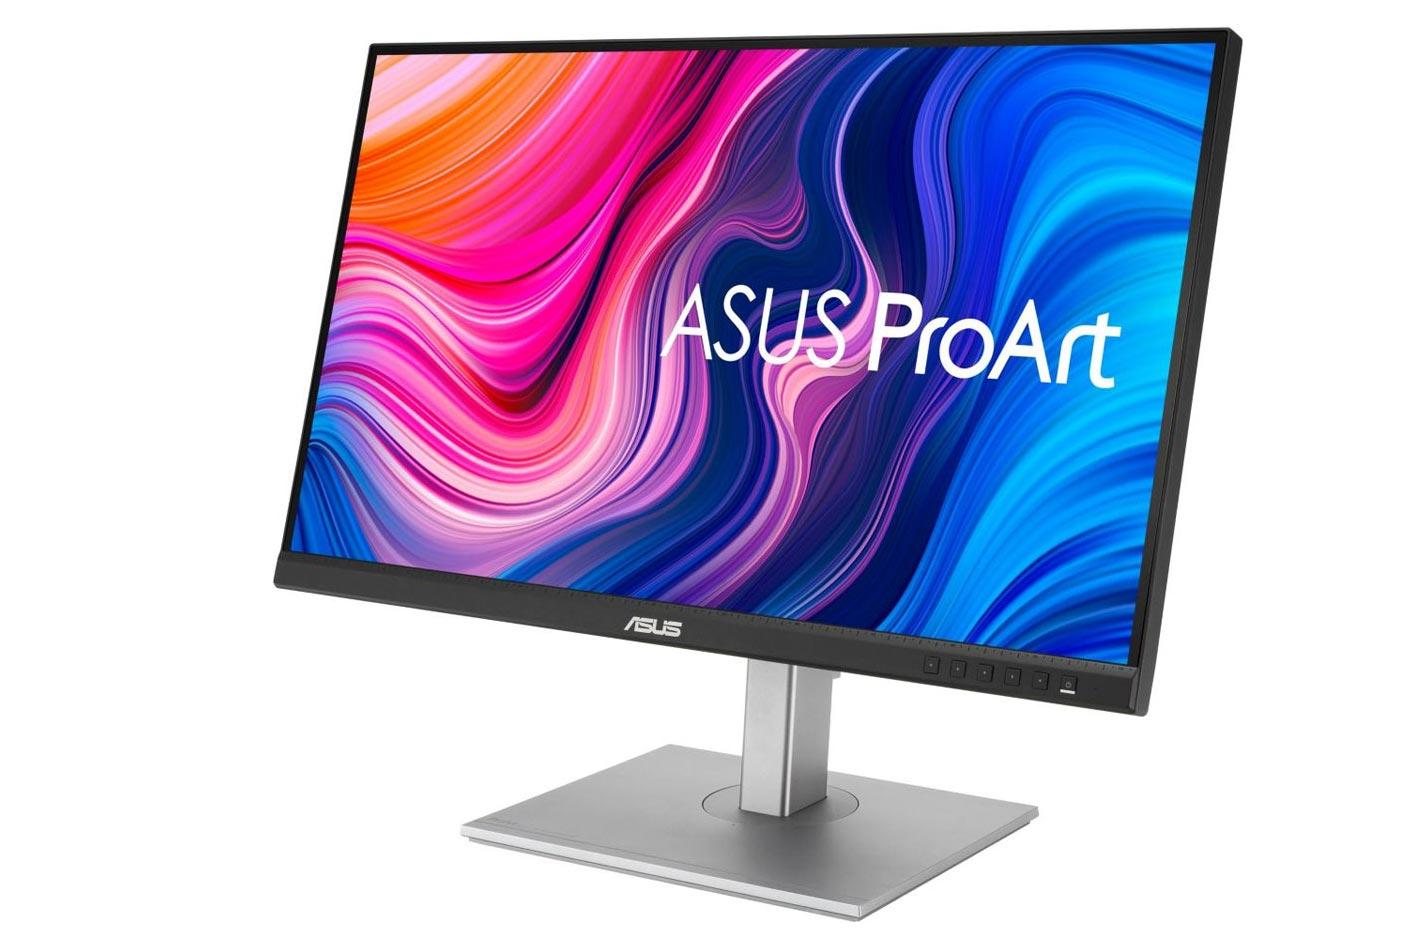 Asus shows professional monitors at CES 2021